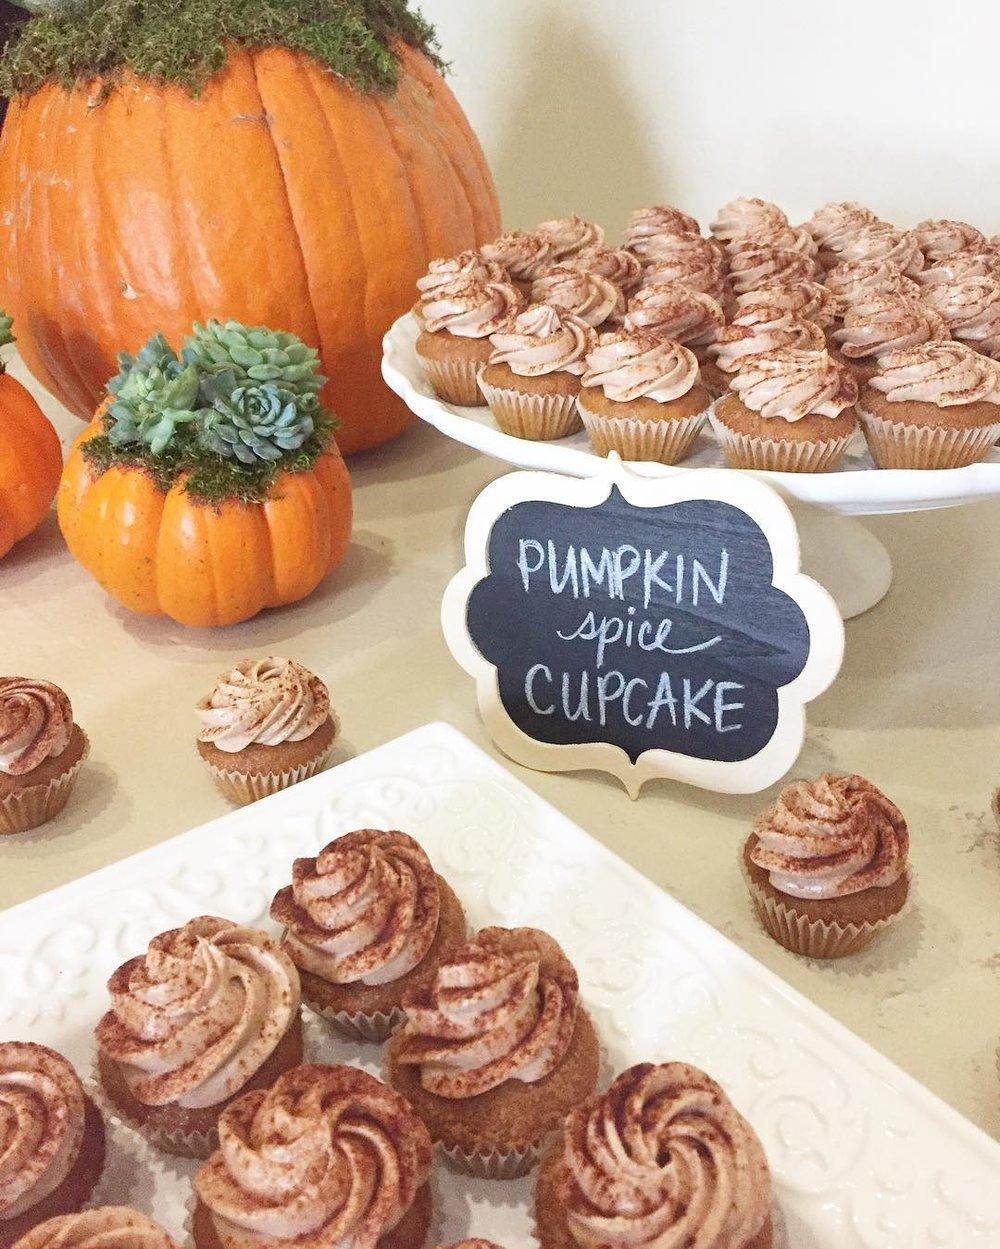 Pumpkin-Spice-Cupcakes.jpg